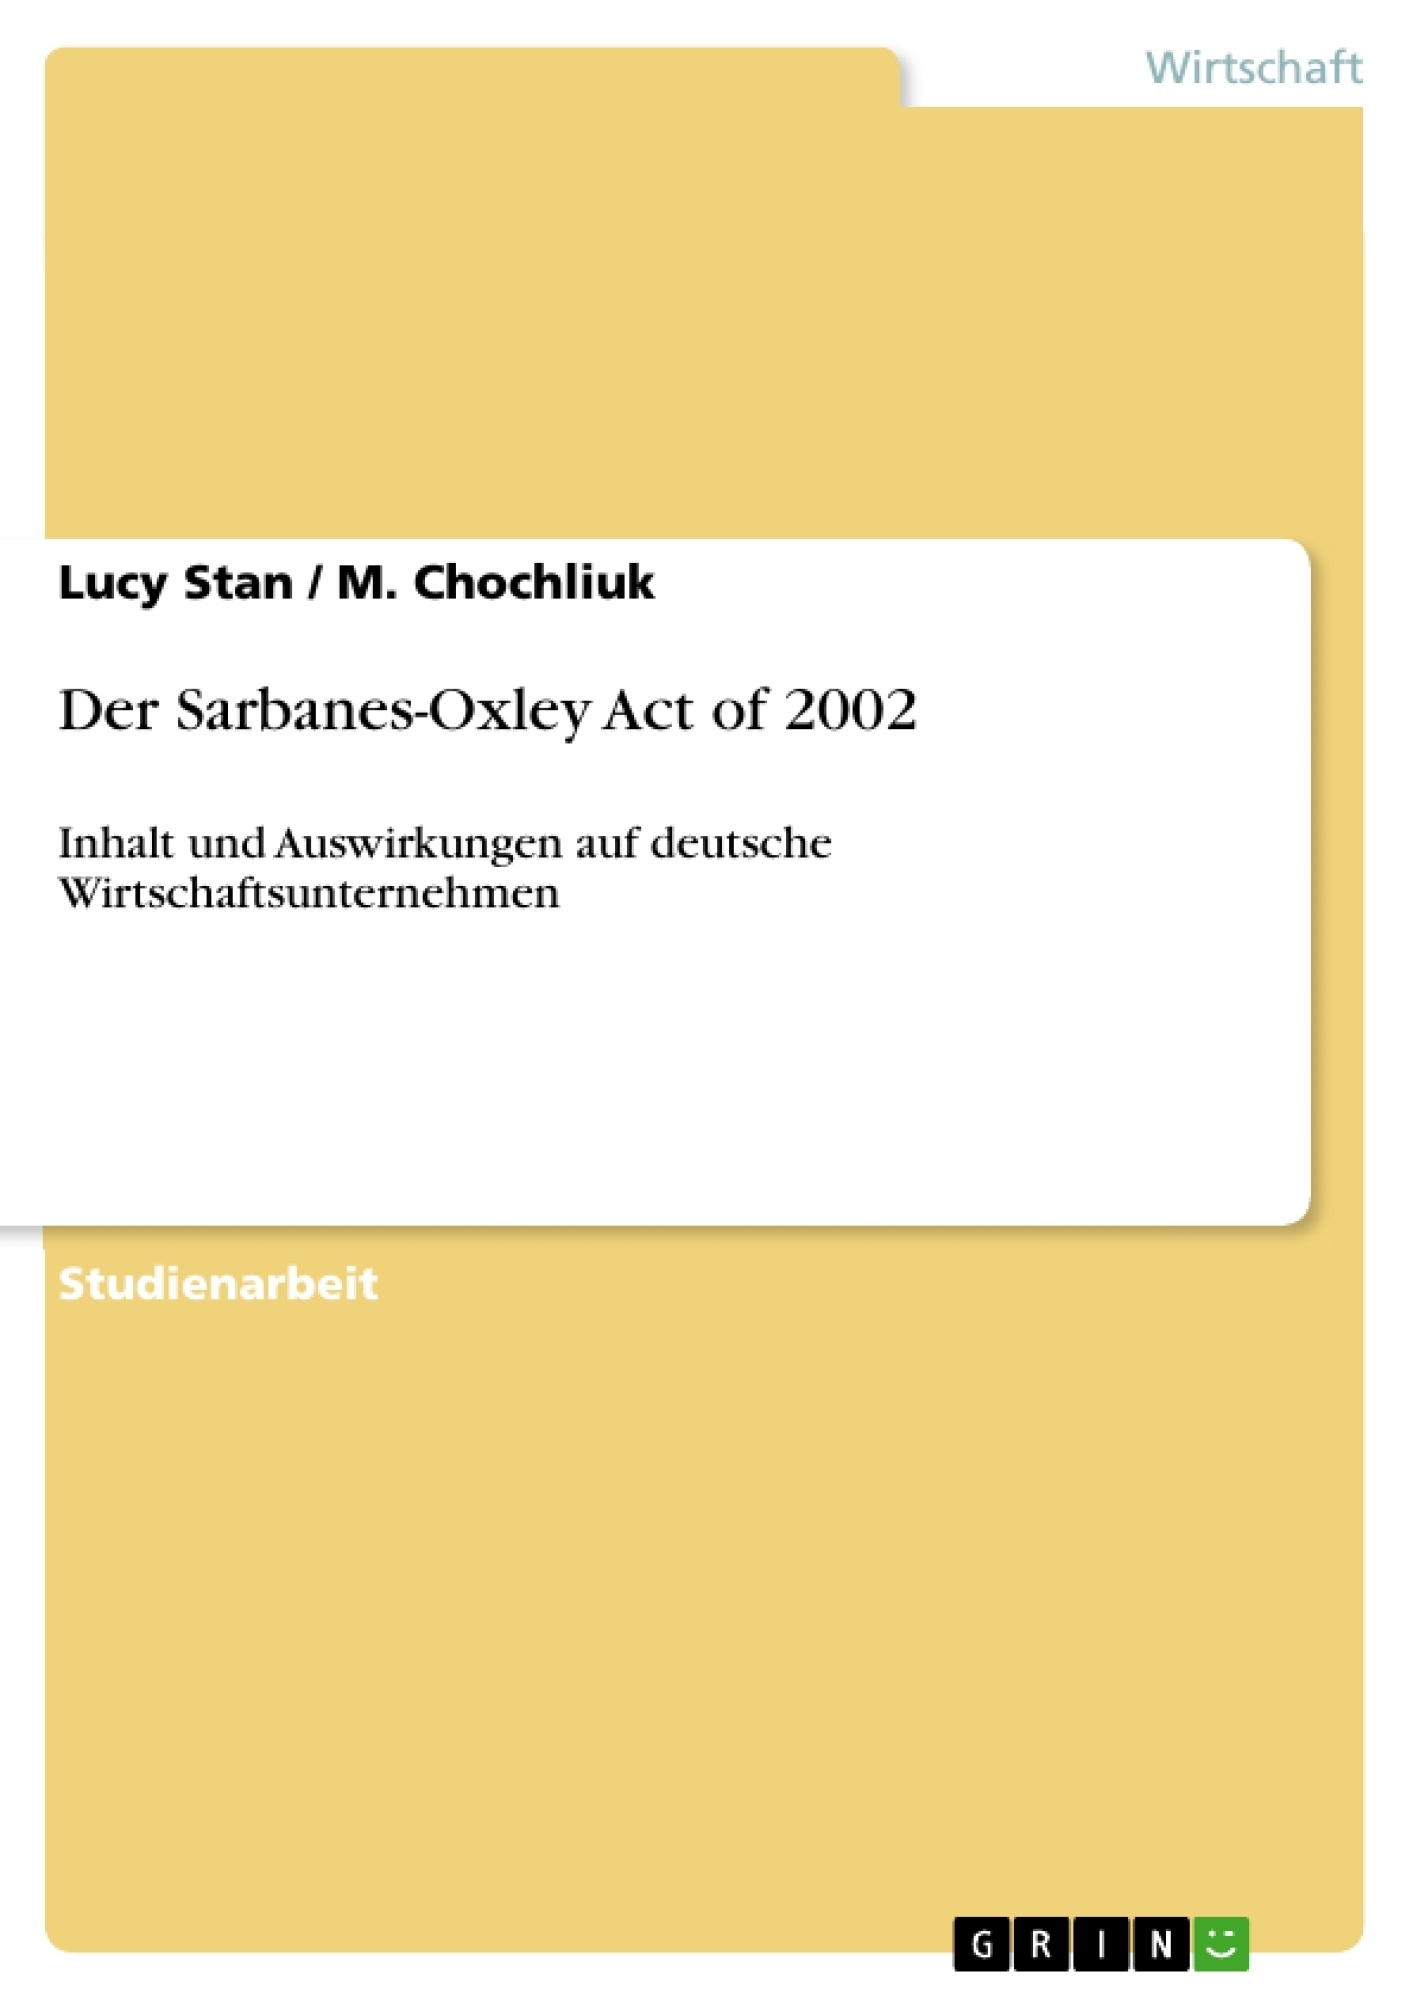 Titel: Der Sarbanes-Oxley Act of 2002